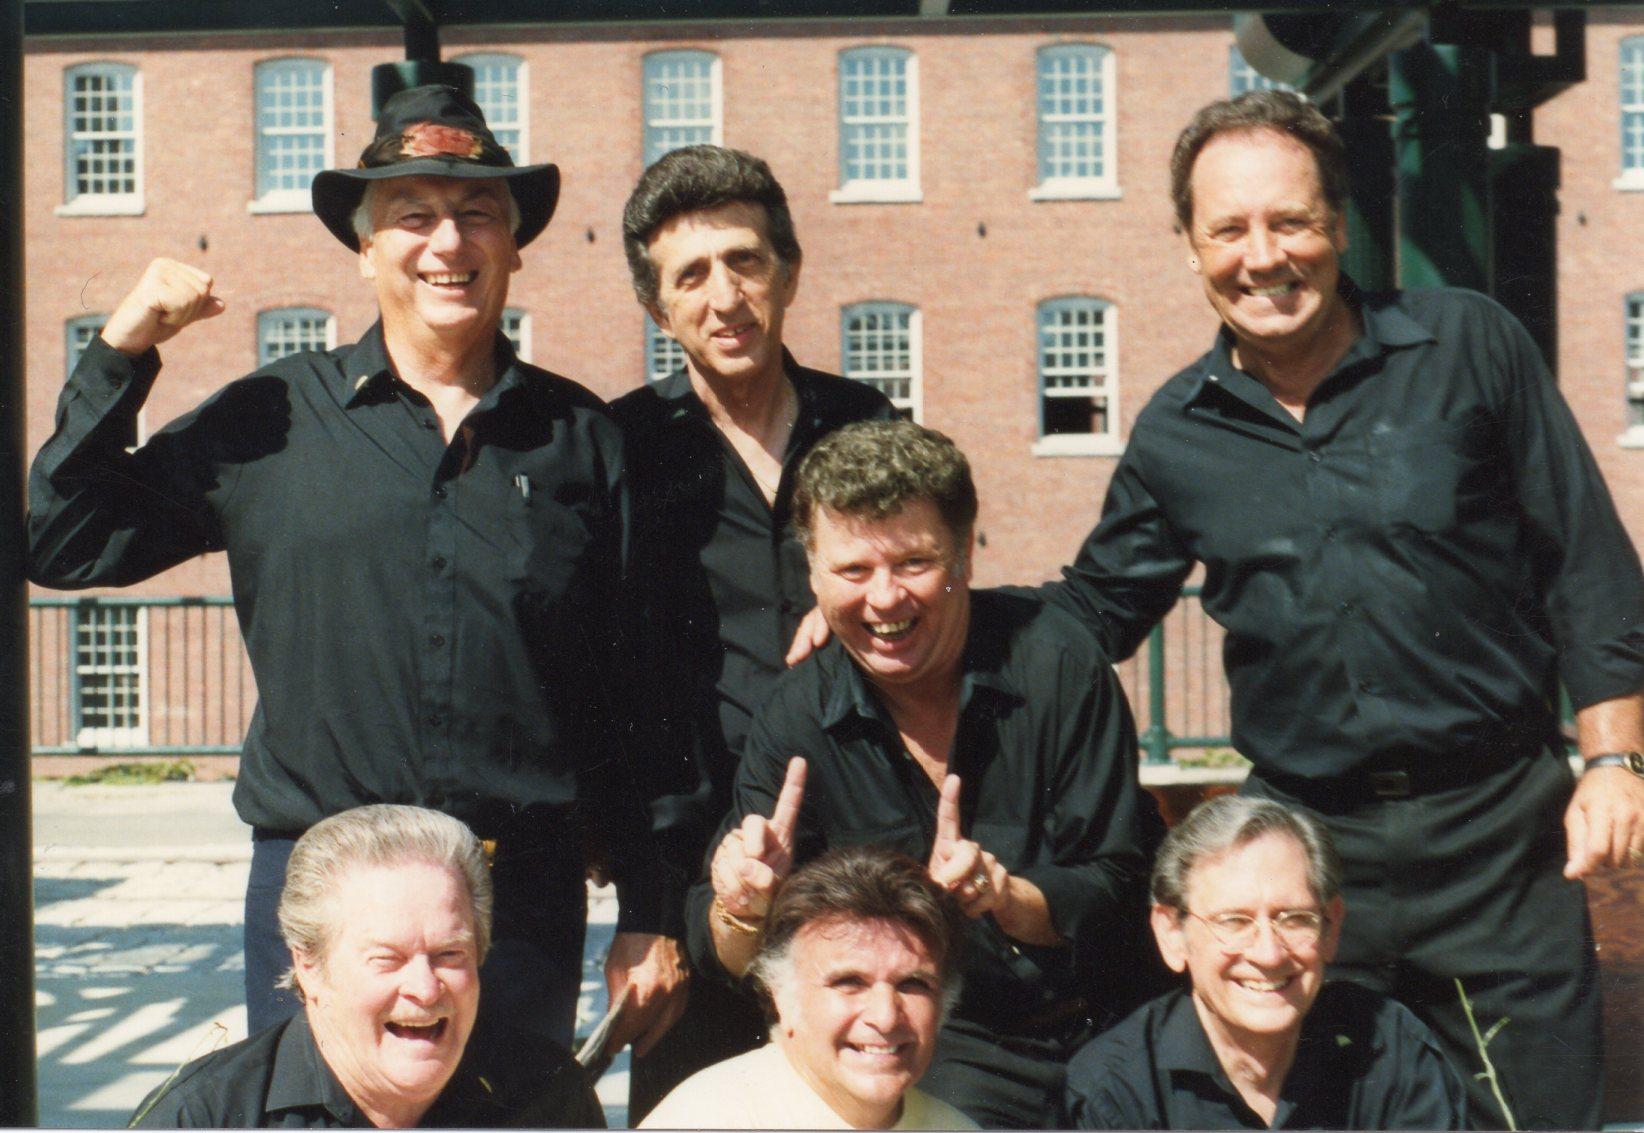 Marcus Van Story, Sonny Burgess, D.J. Fontana, J.L. Smoochy Smith, Paul Burlison & Stan Kesler (Sun Rhythm Section)